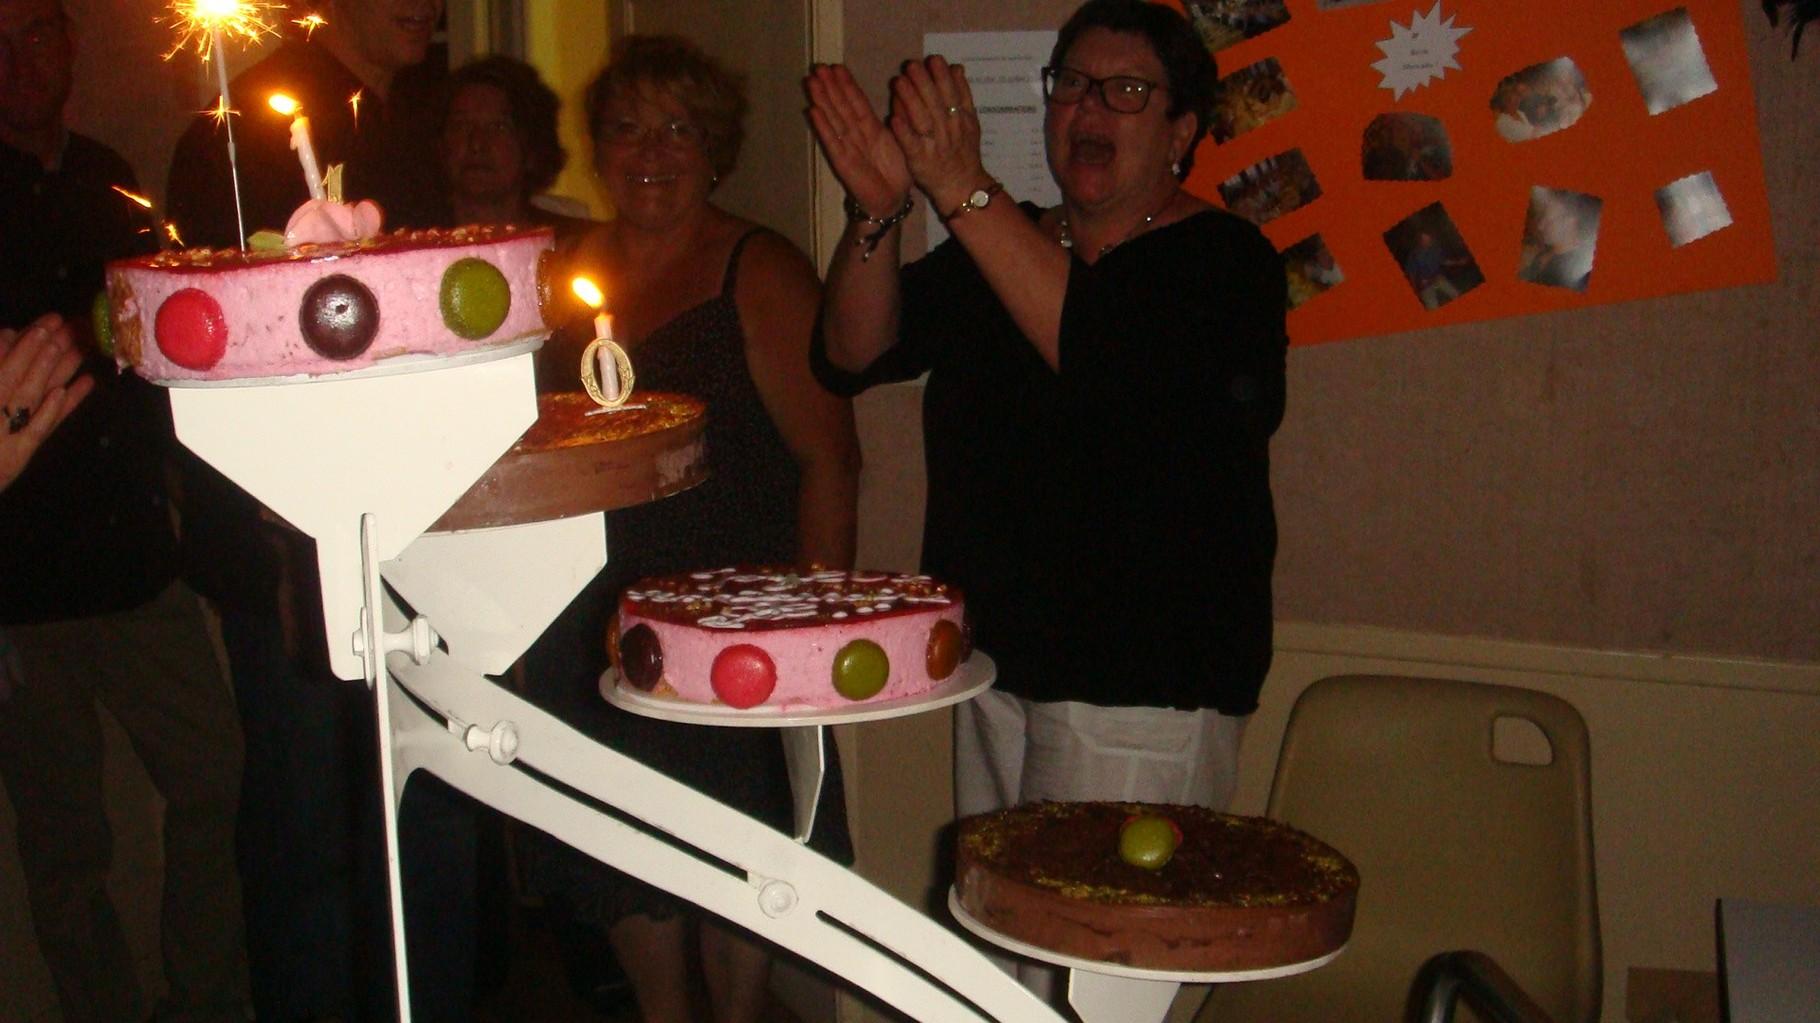 Le gâteau - 10 Ans déja..